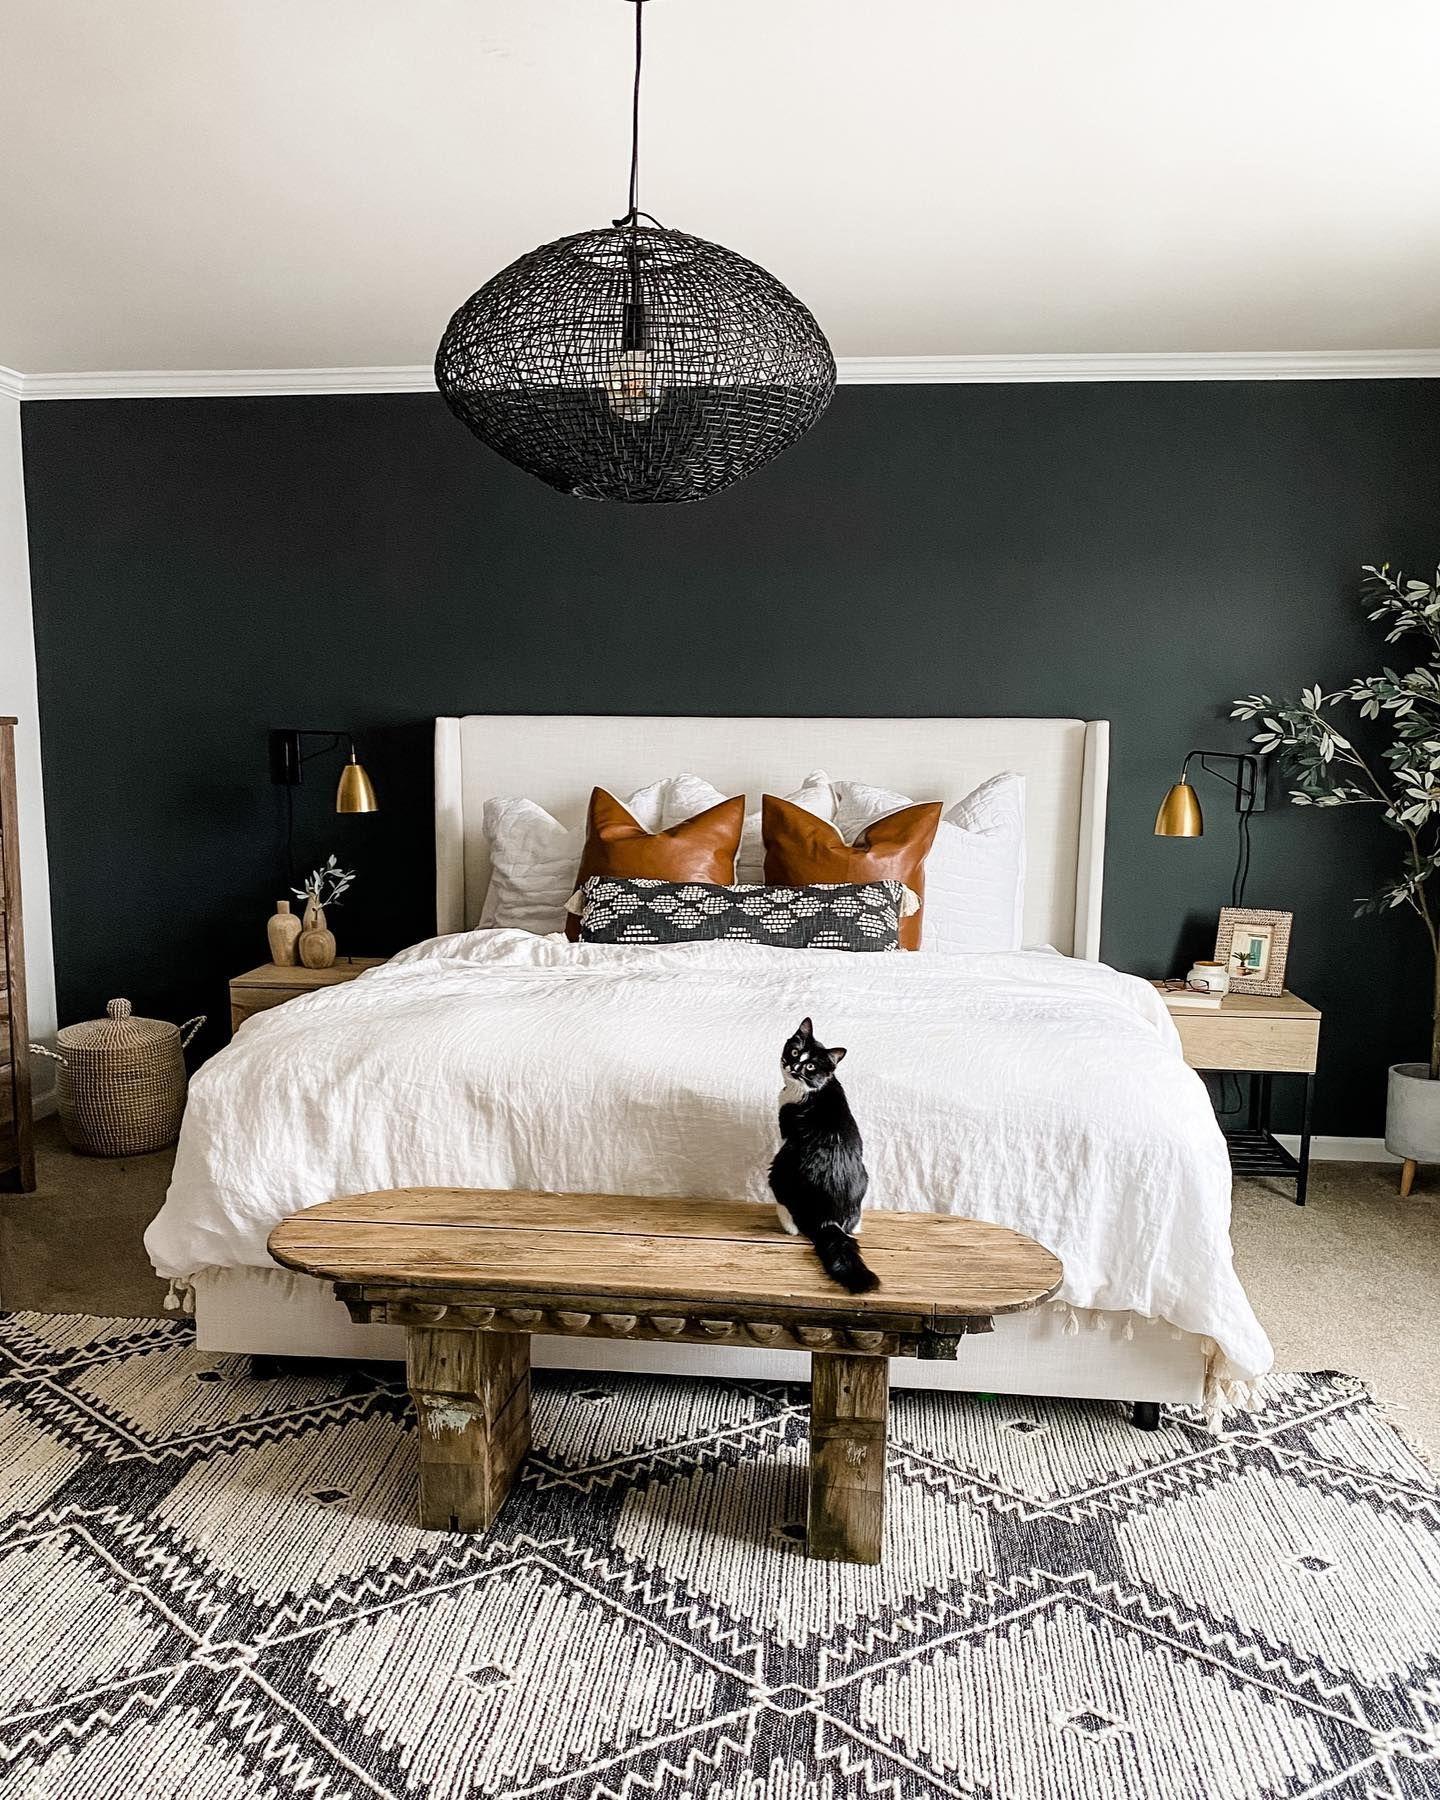 Brownhills Area Rug Boutique Rugs In 2020 Home Decor Bedroom Design Bedroom Interior